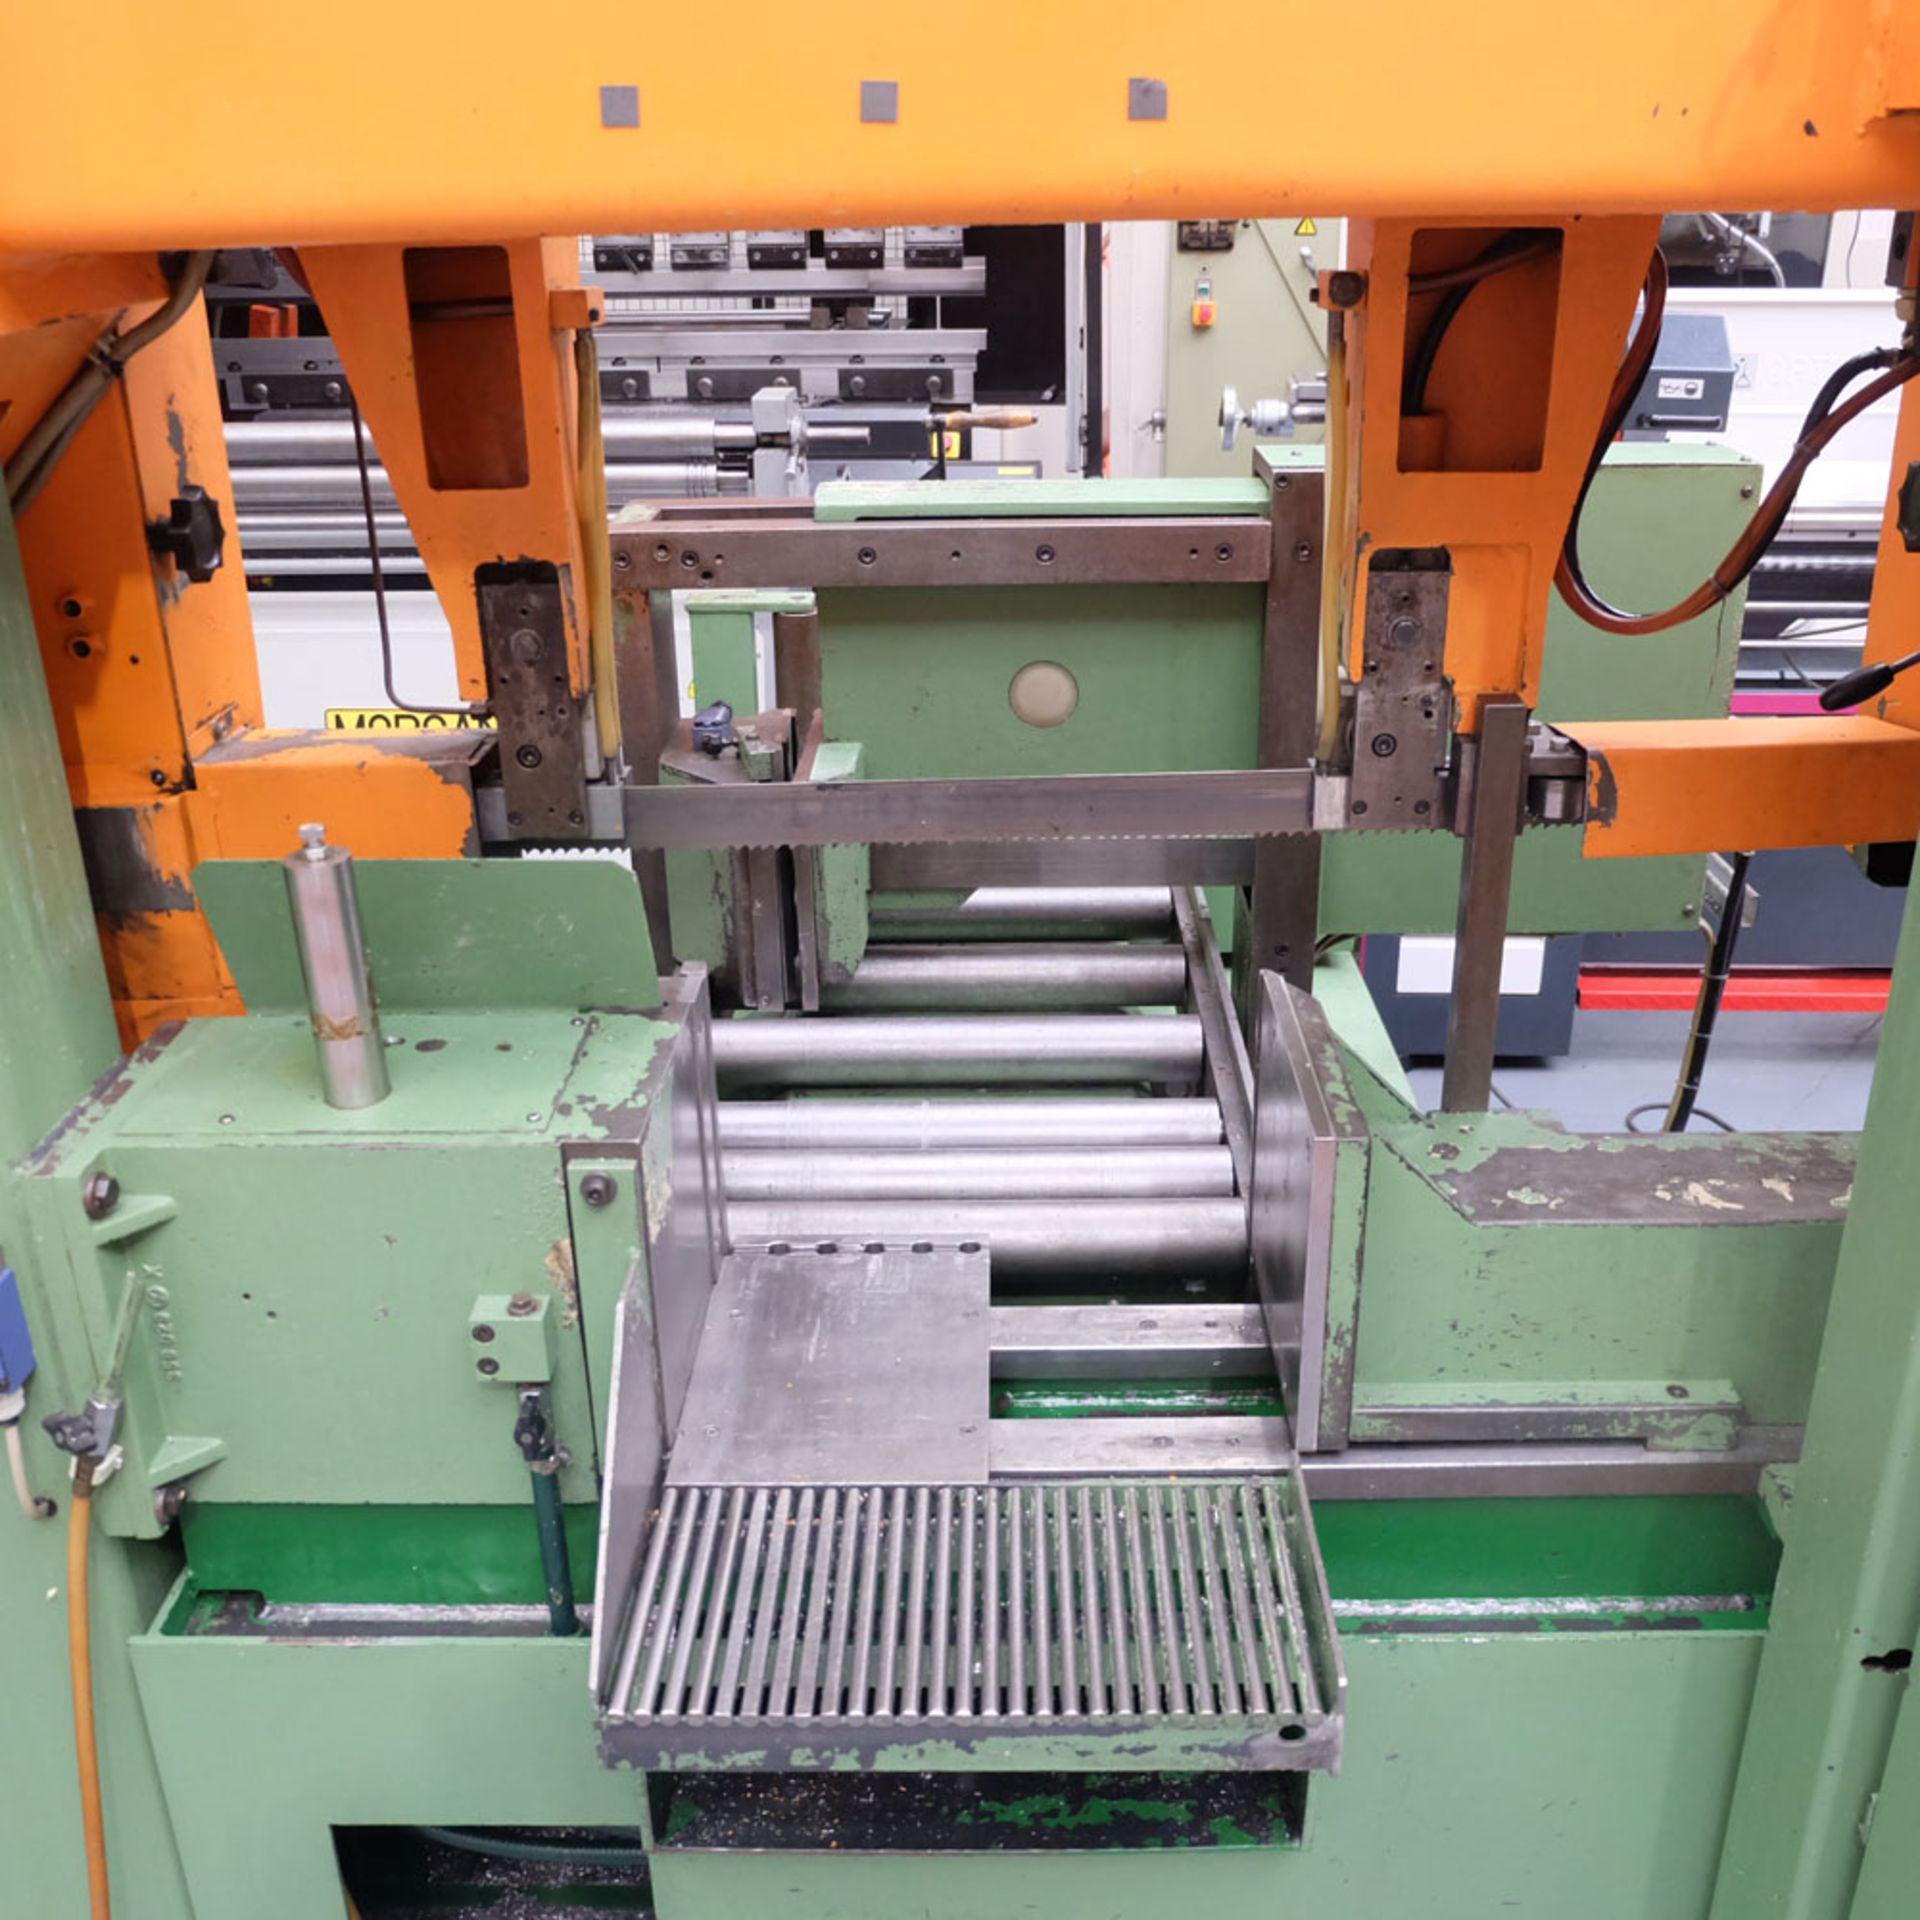 Kasto HBA 420 AU Heavy Duty Automatic Horizontal Band Sawing Machine. - Image 2 of 7